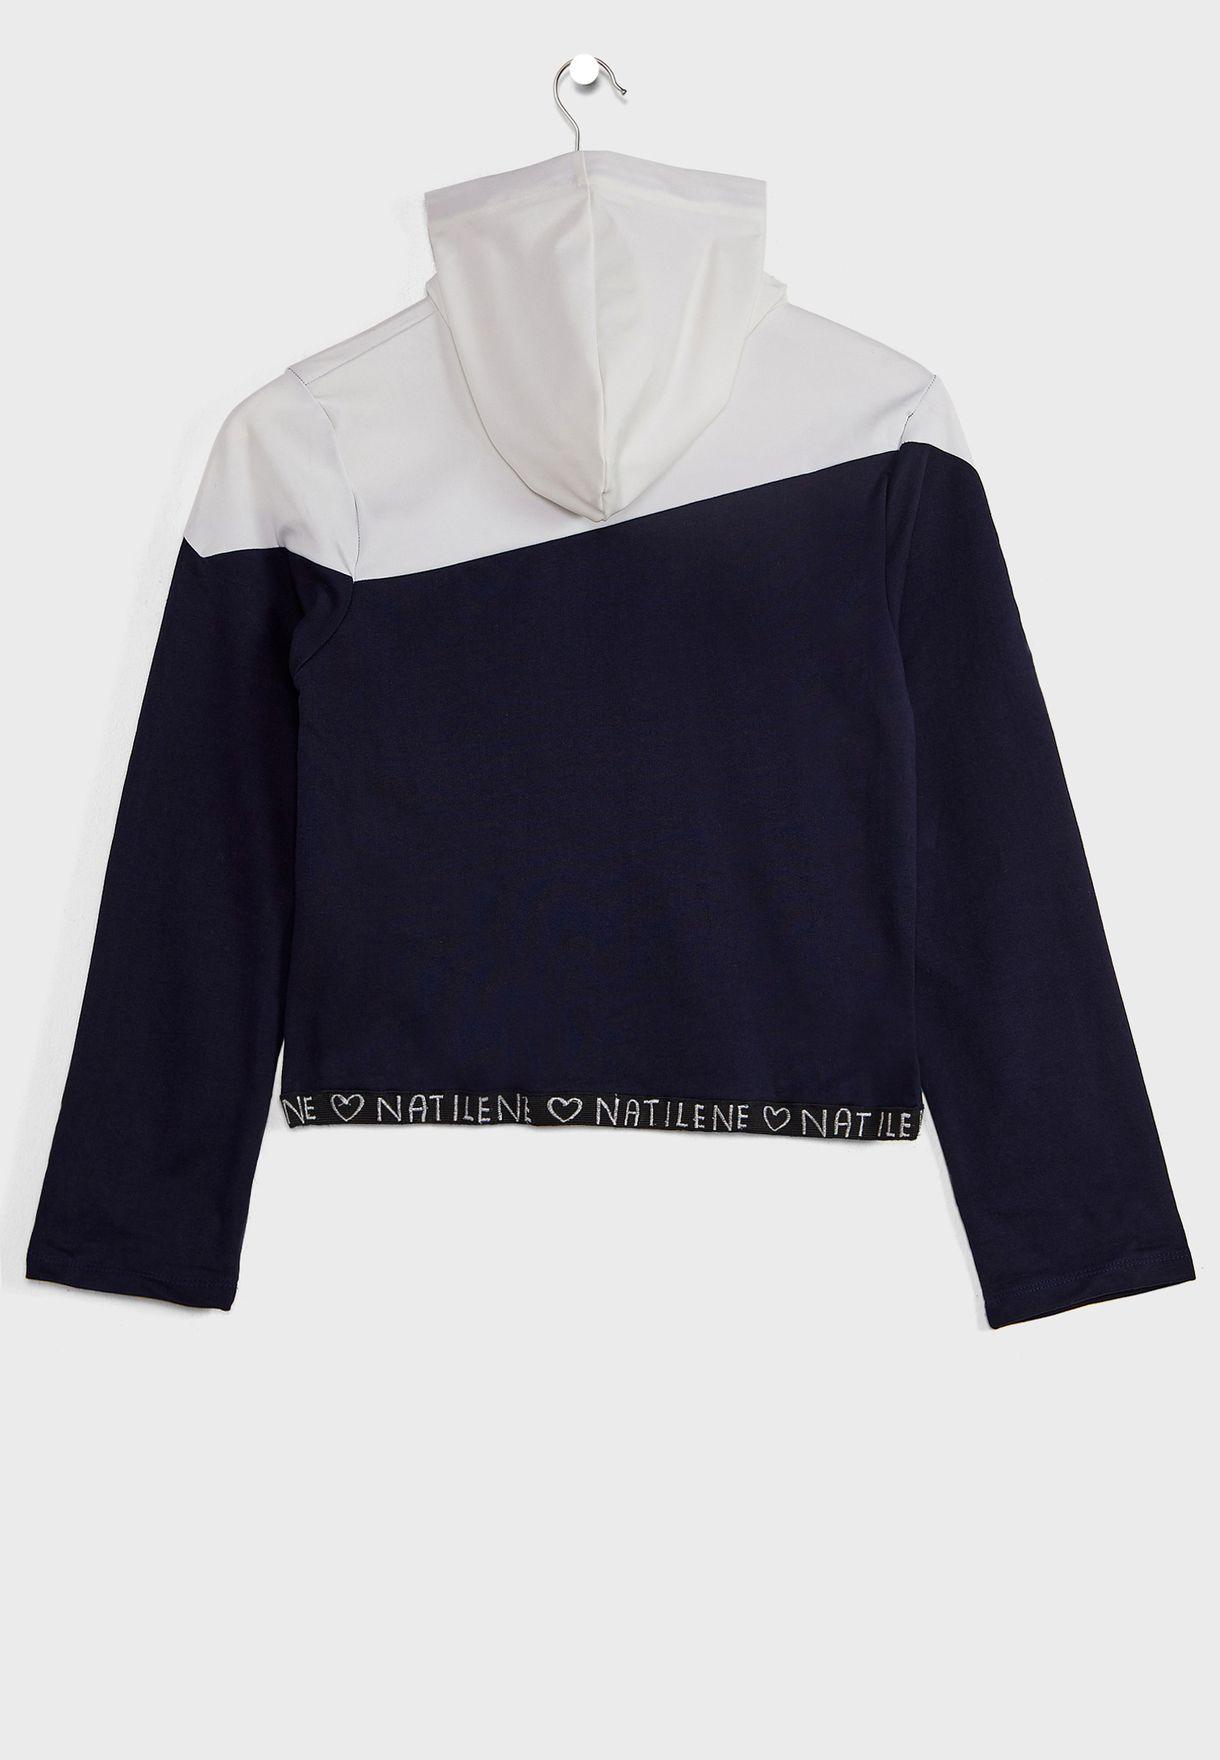 Natilene Urblocked Hooded Sweatshirt